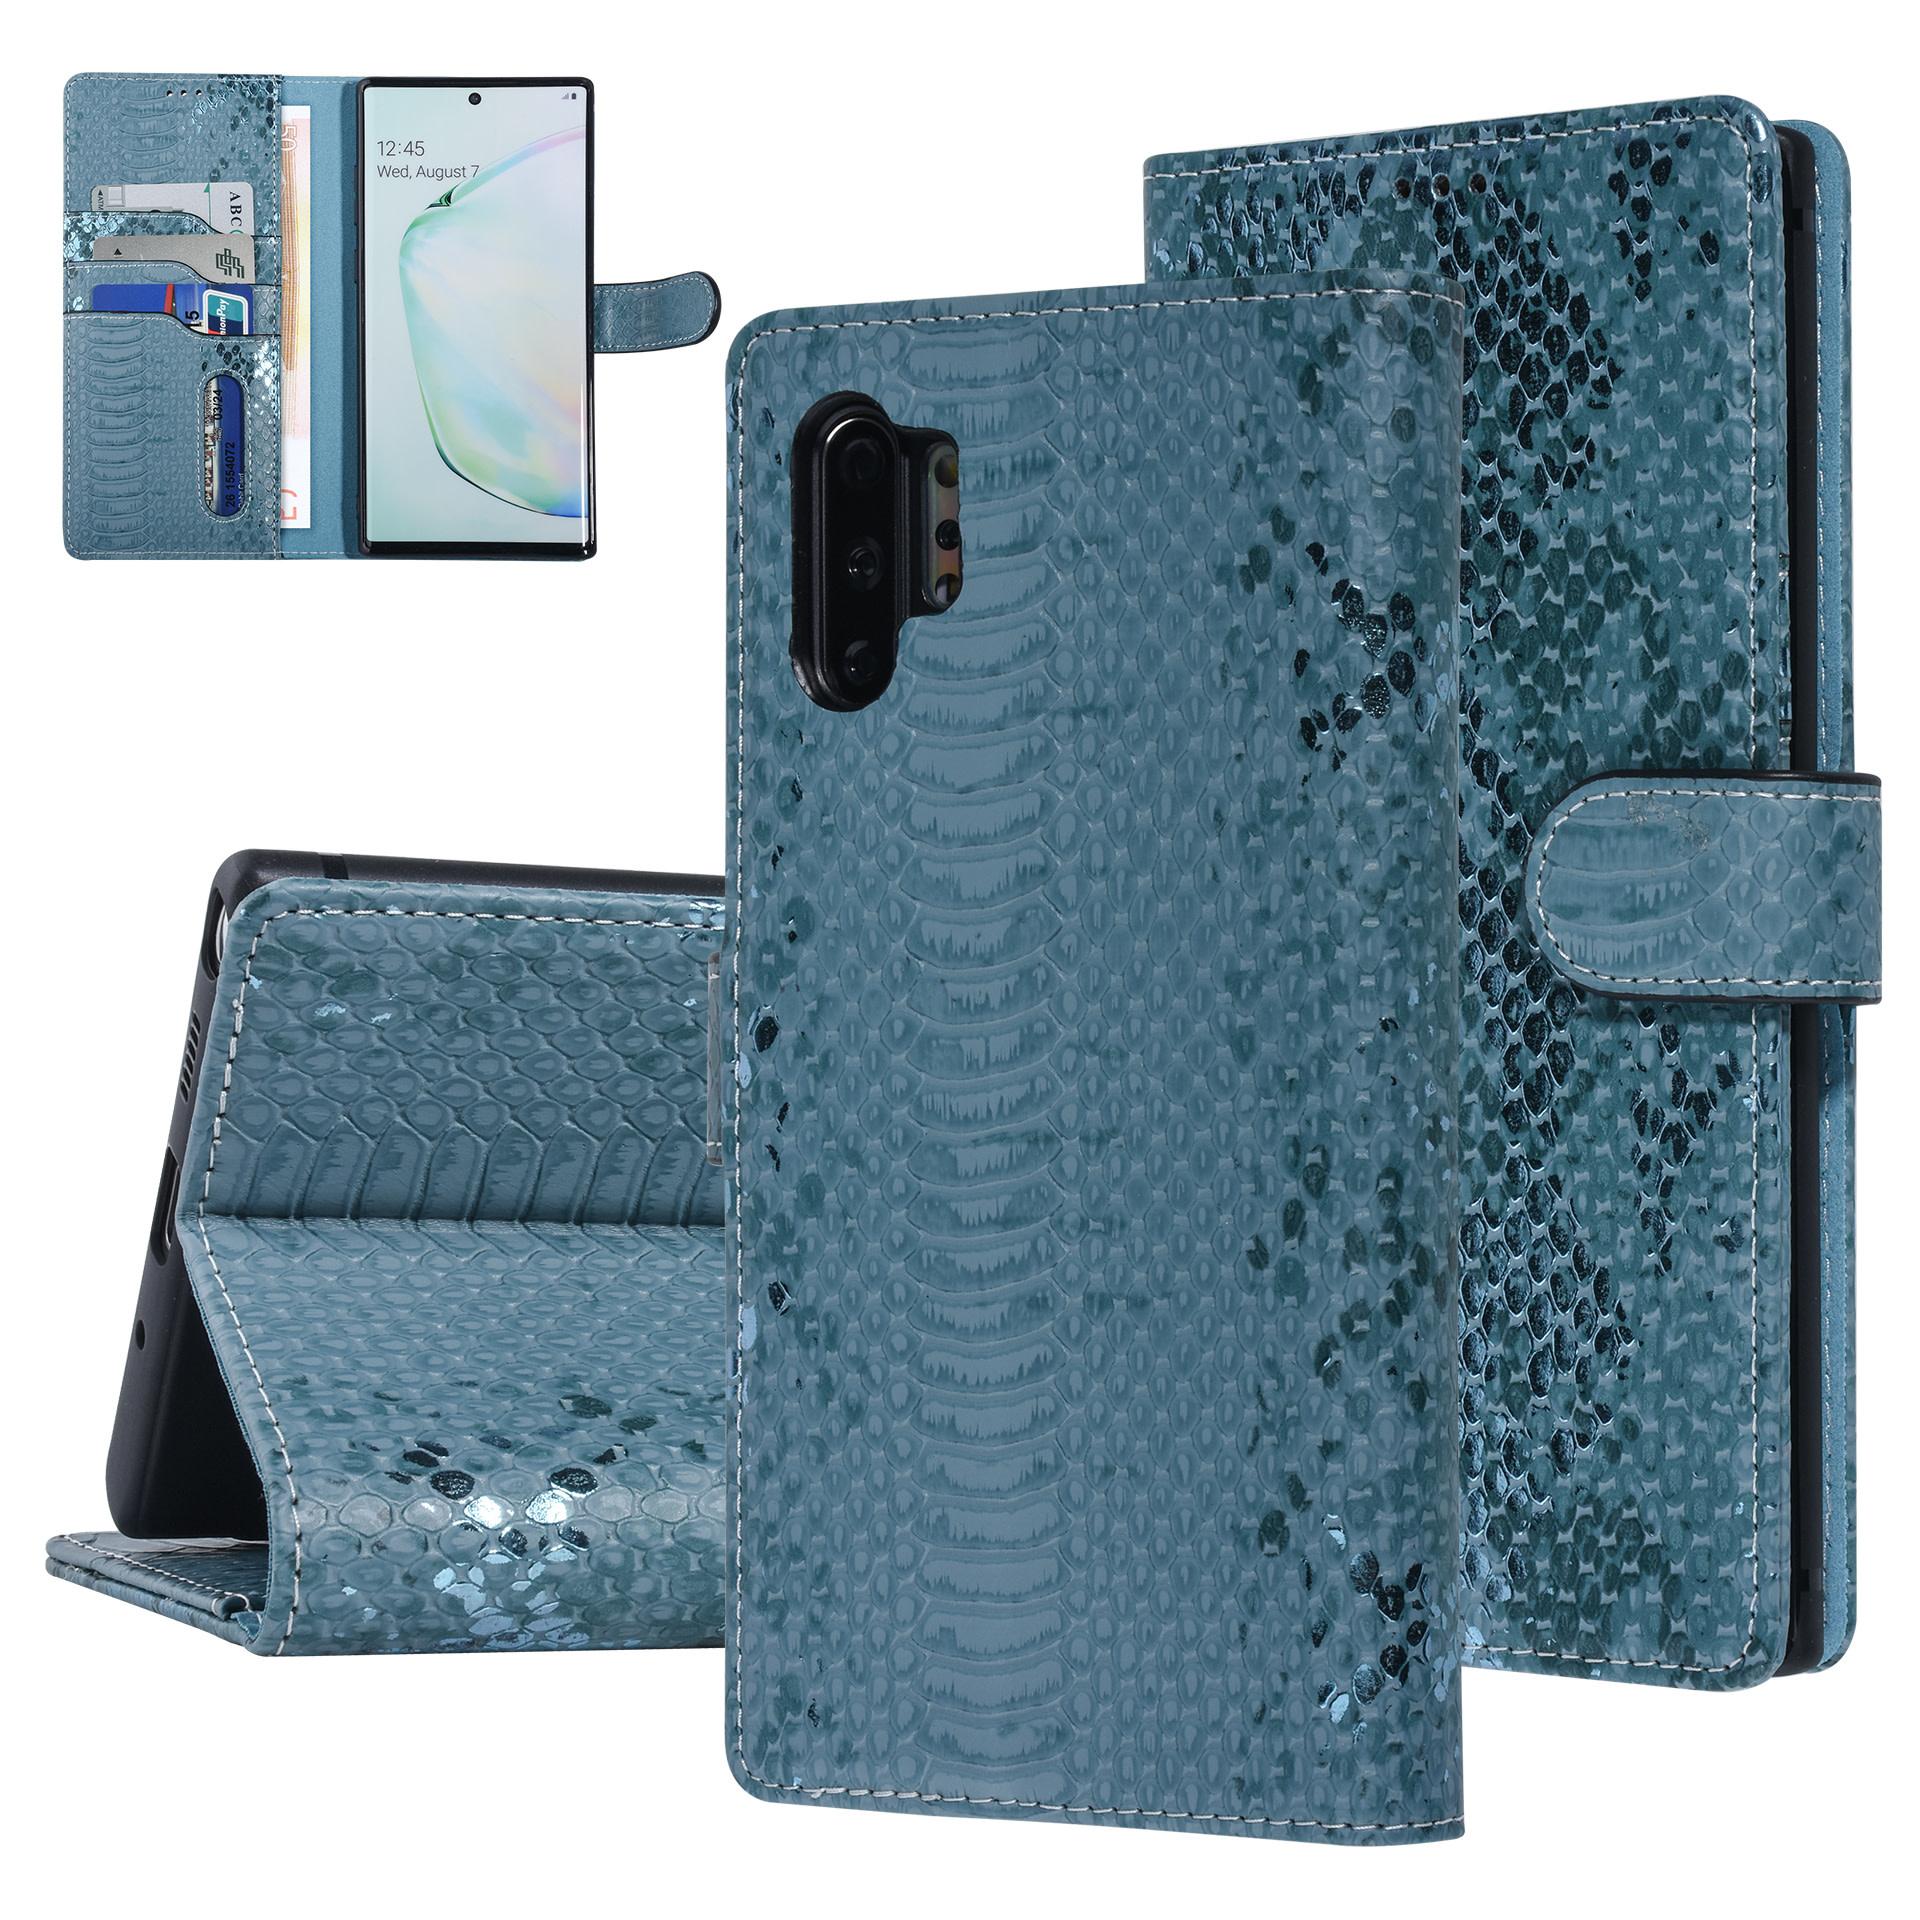 UNIQ Accessory Galaxy Note 10 Plus Grün Schlangenhaut Book-Case hul